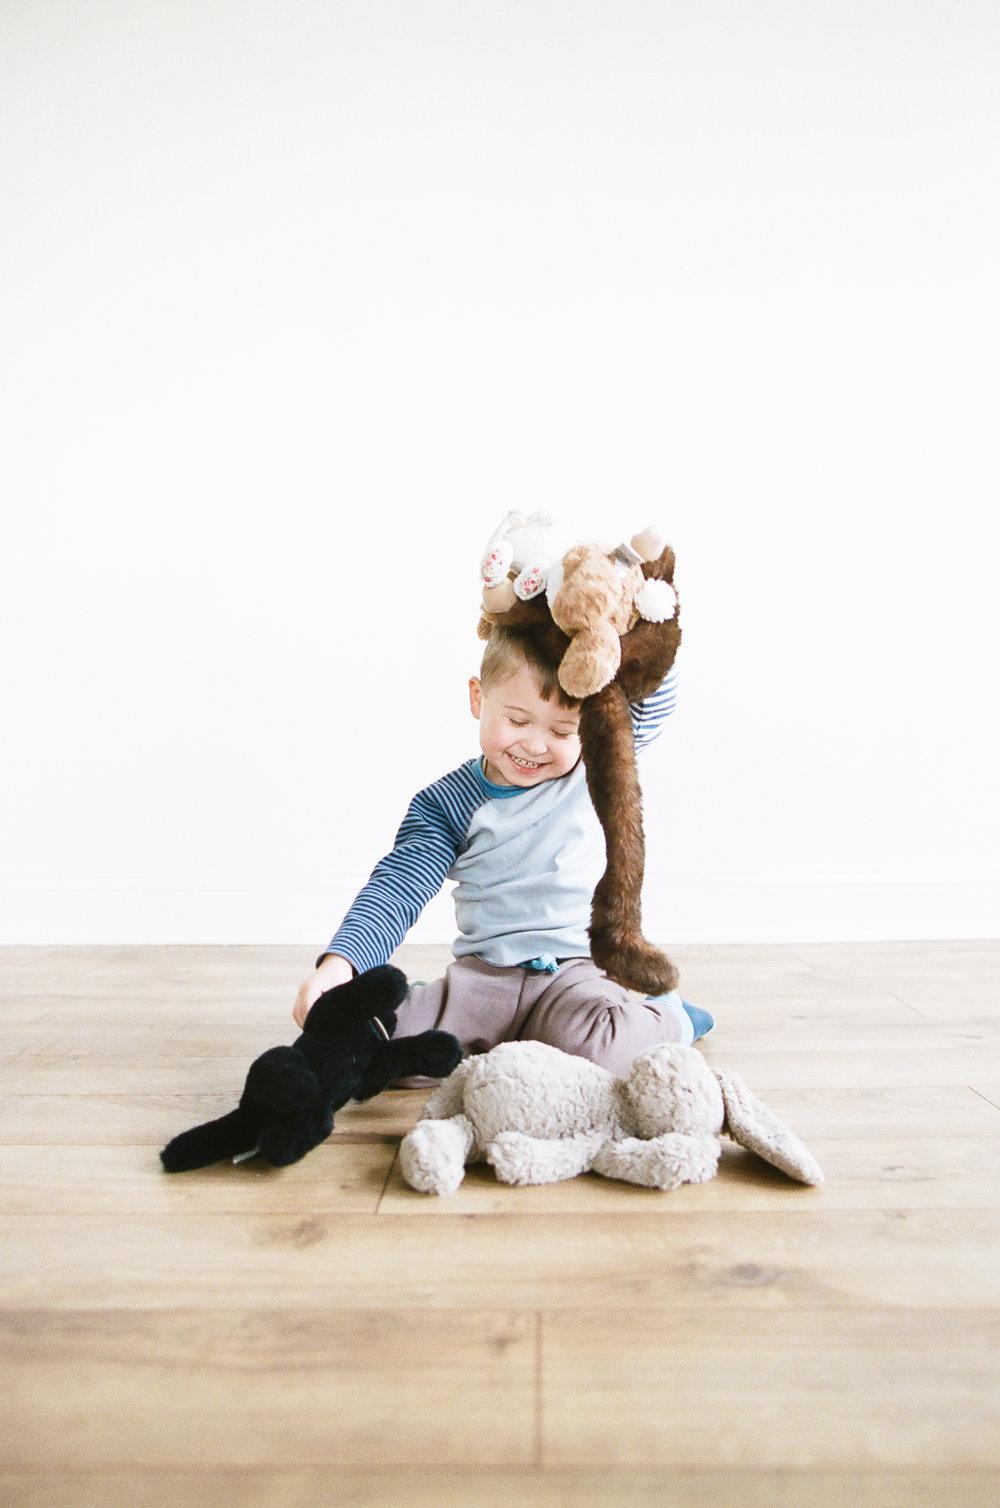 Children's Fashion Photographer